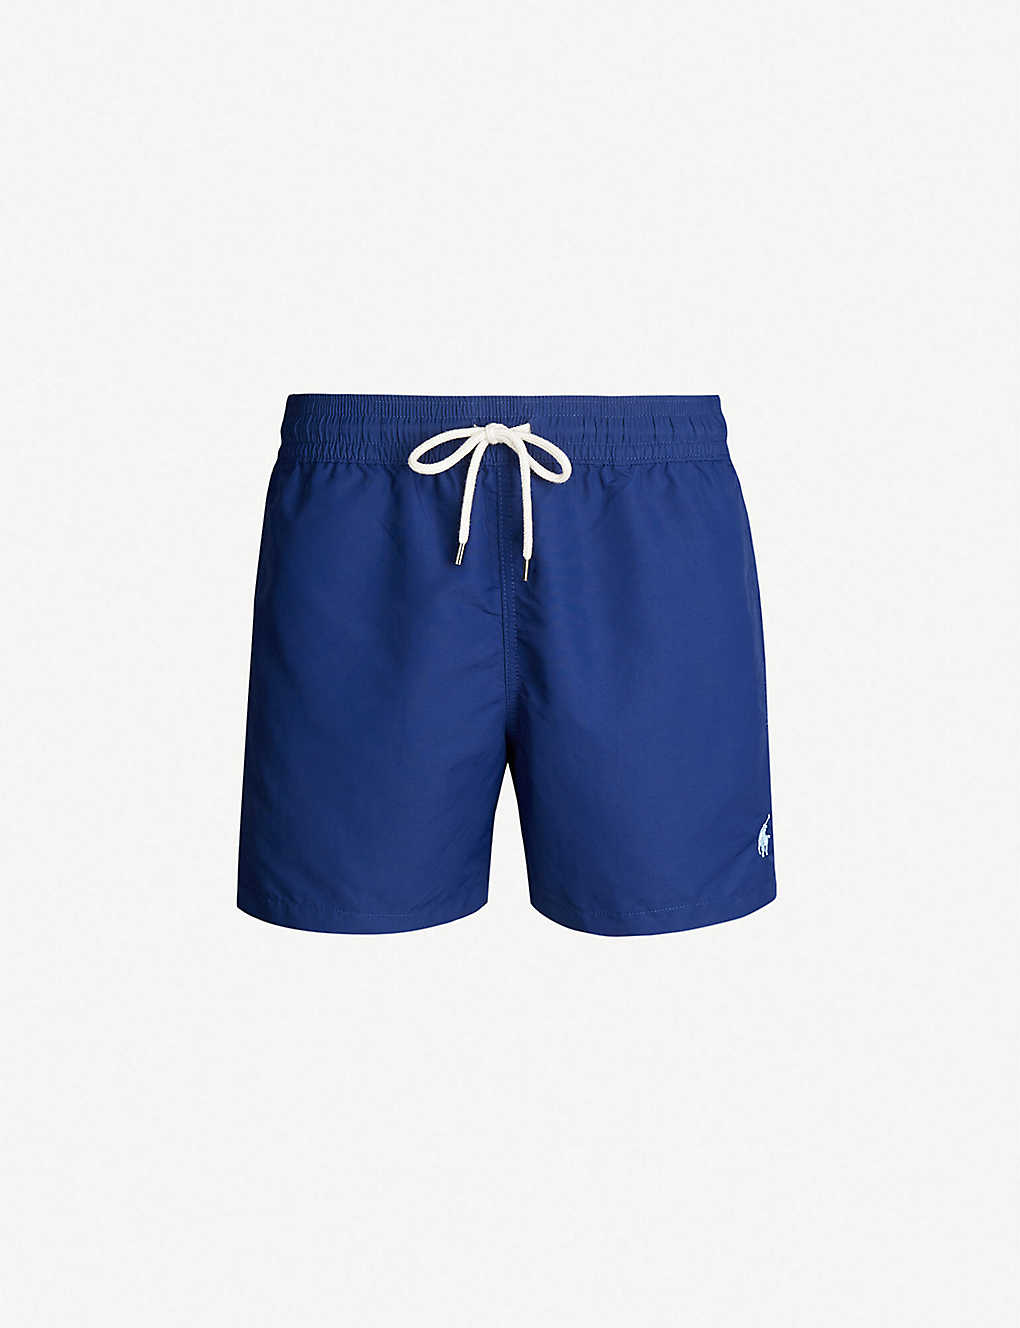 f6003af5b5212 POLO RALPH LAUREN - Traveller slim-fit swim shorts | Selfridges.com